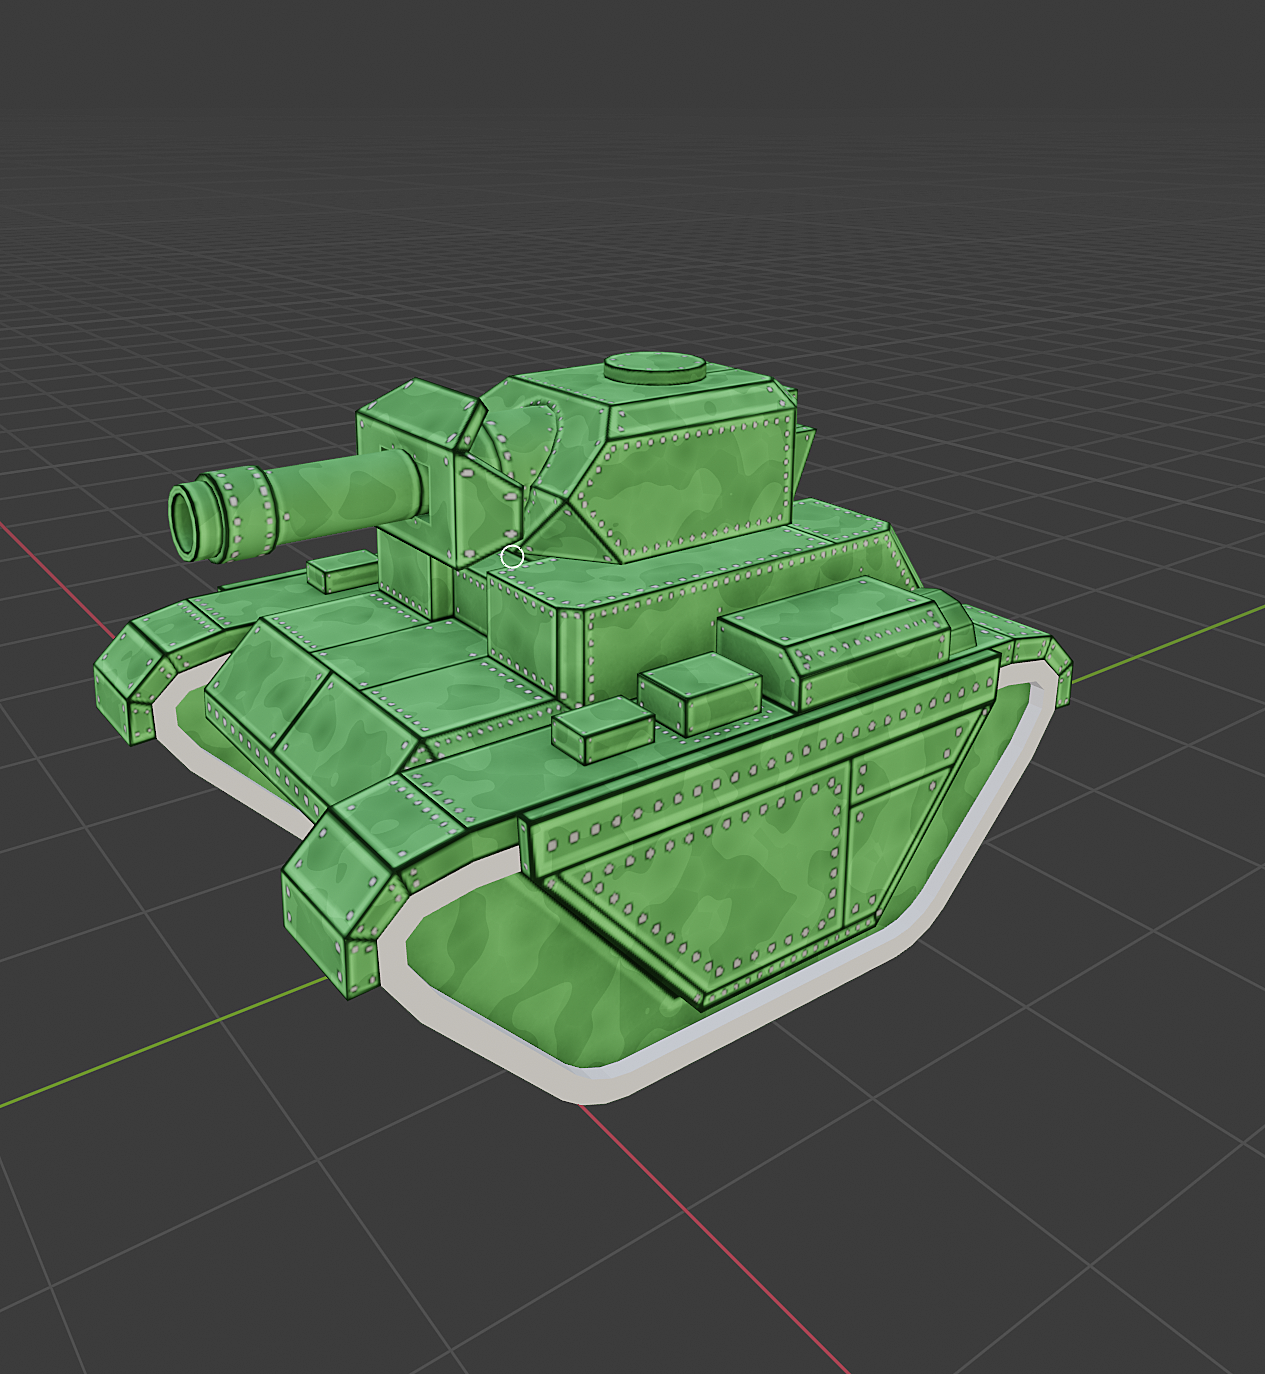 Tank camouflage